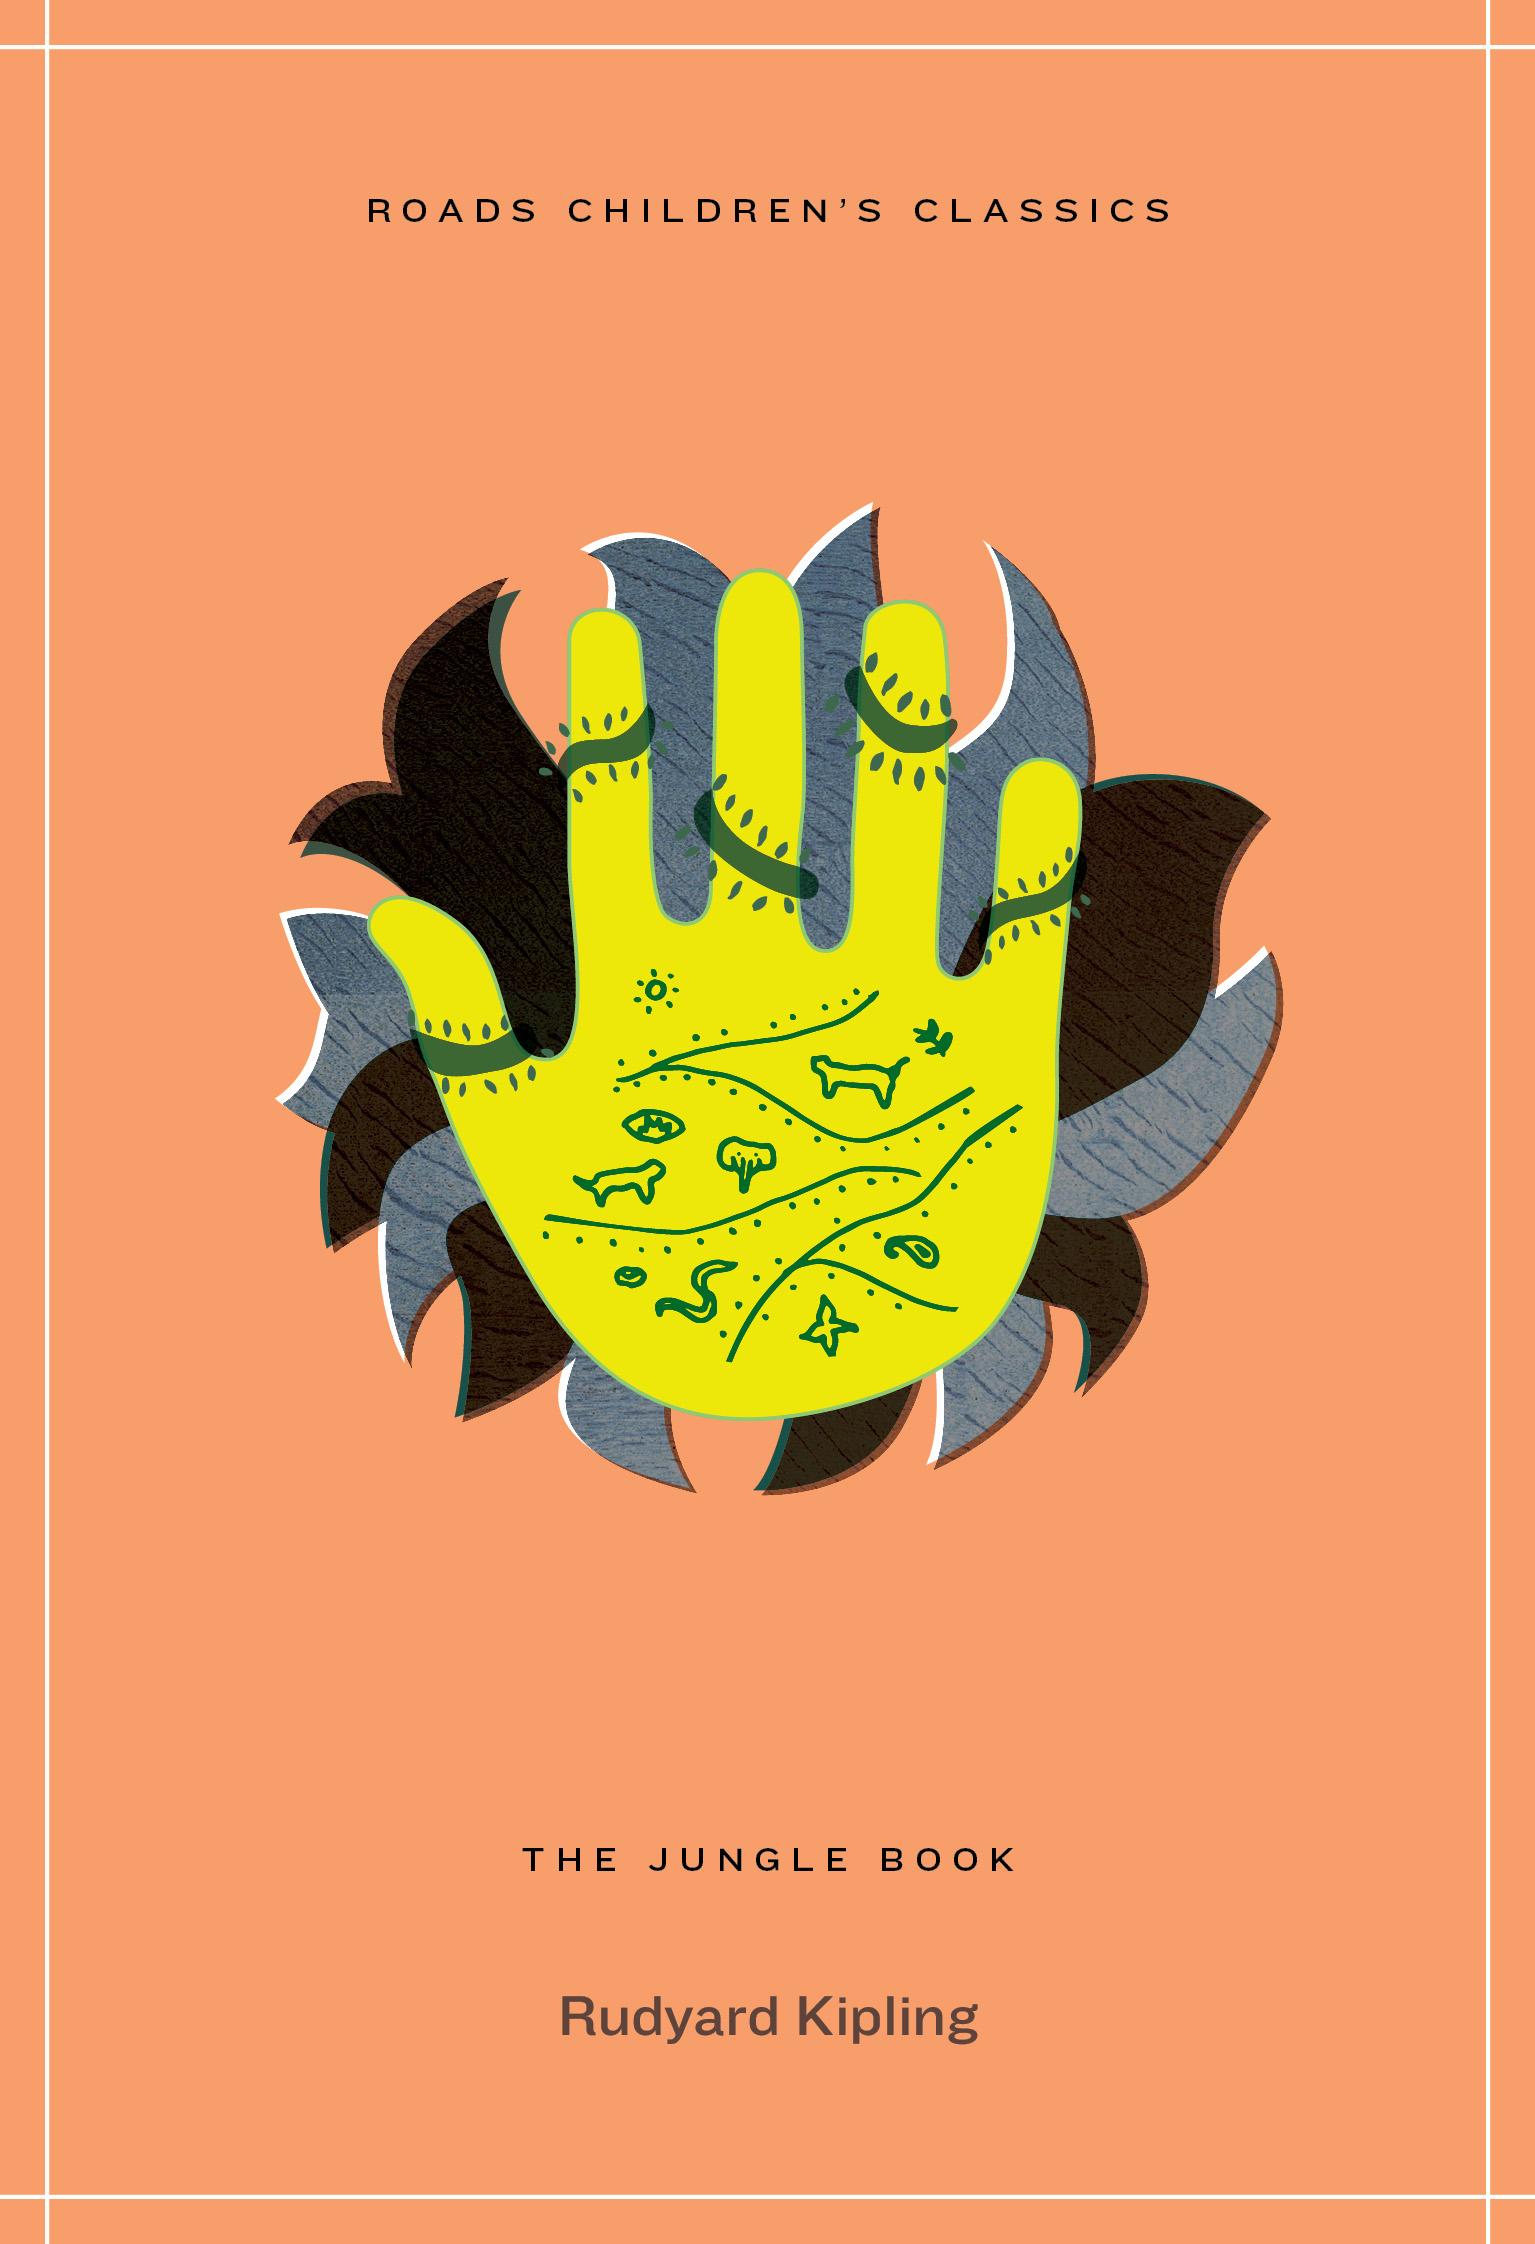 Cover image: The Jungle Book